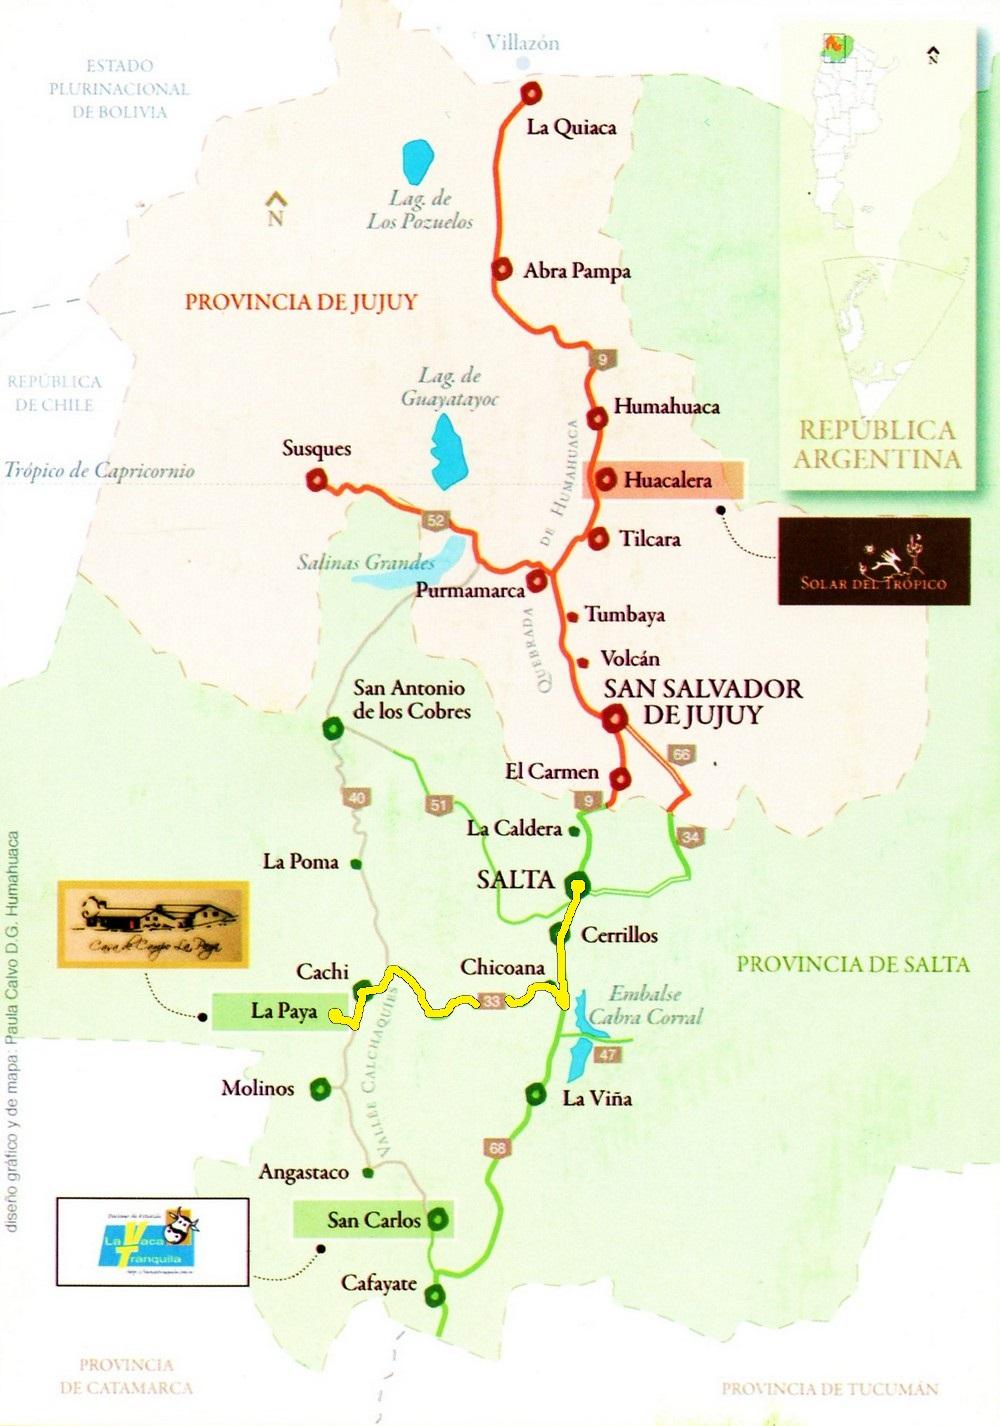 CARTE Jour 12 de La Paya à Salta